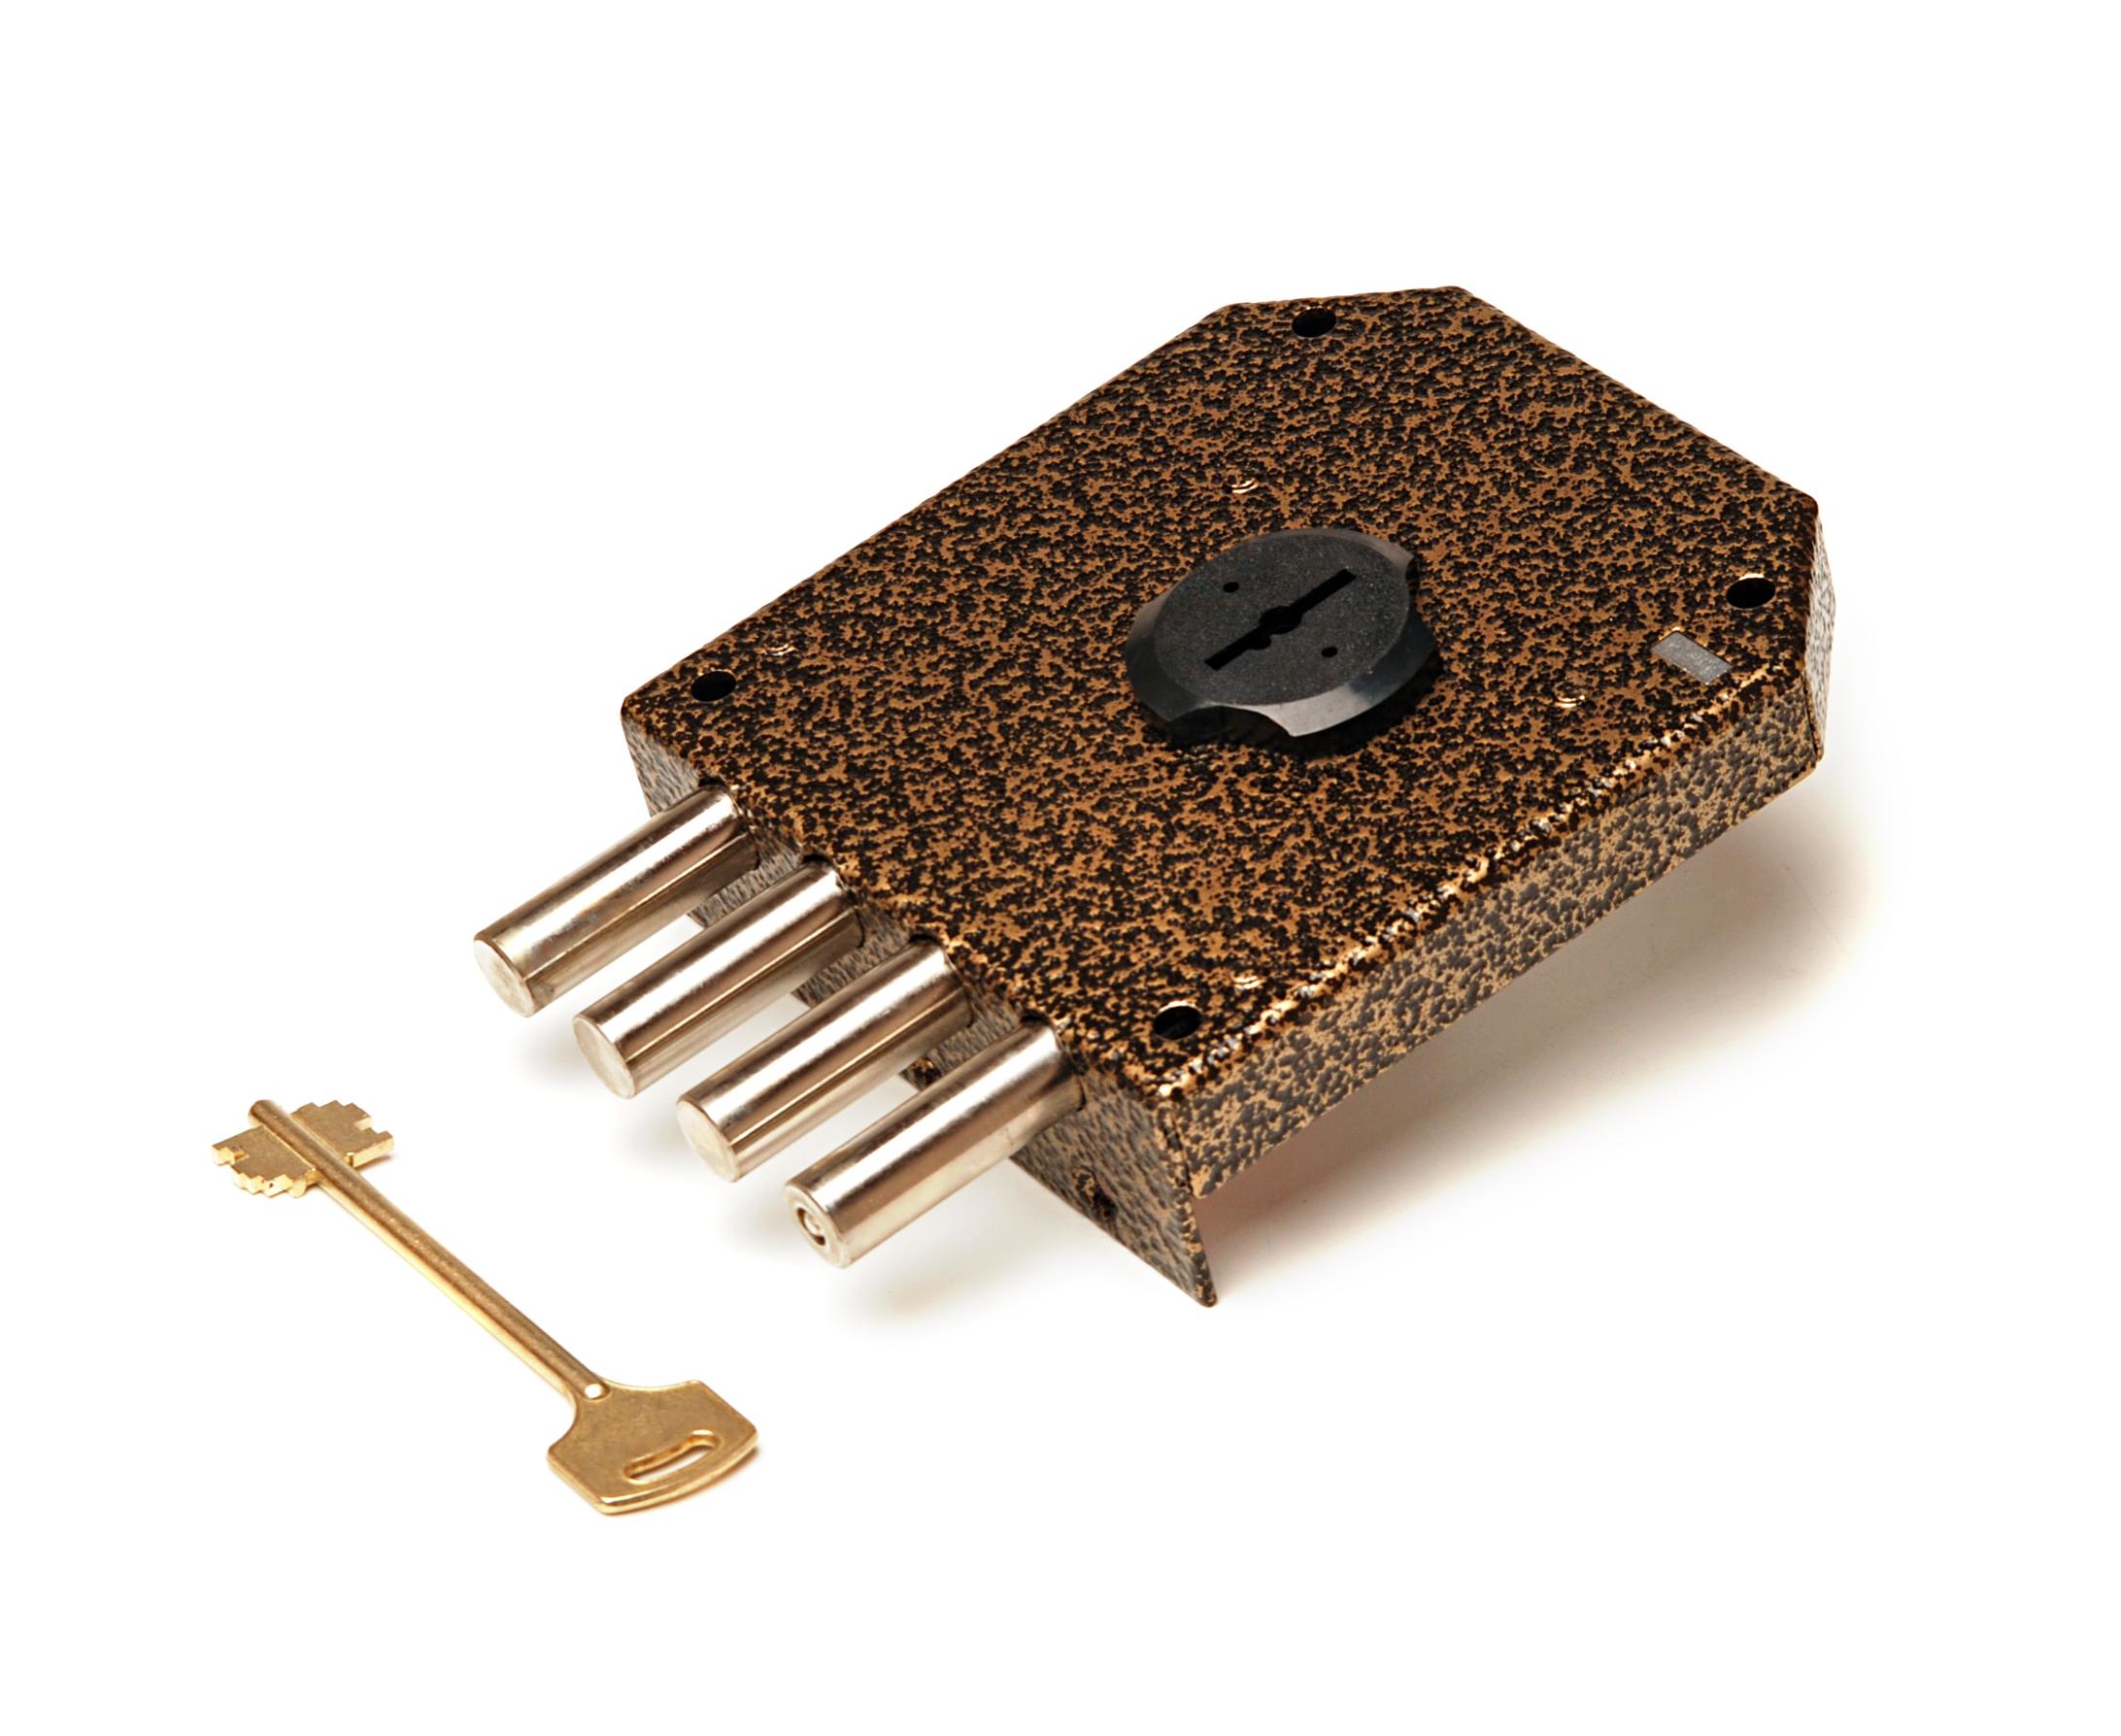 Базальт Н-1.05.51.5.5.1 (3-20) с накл.